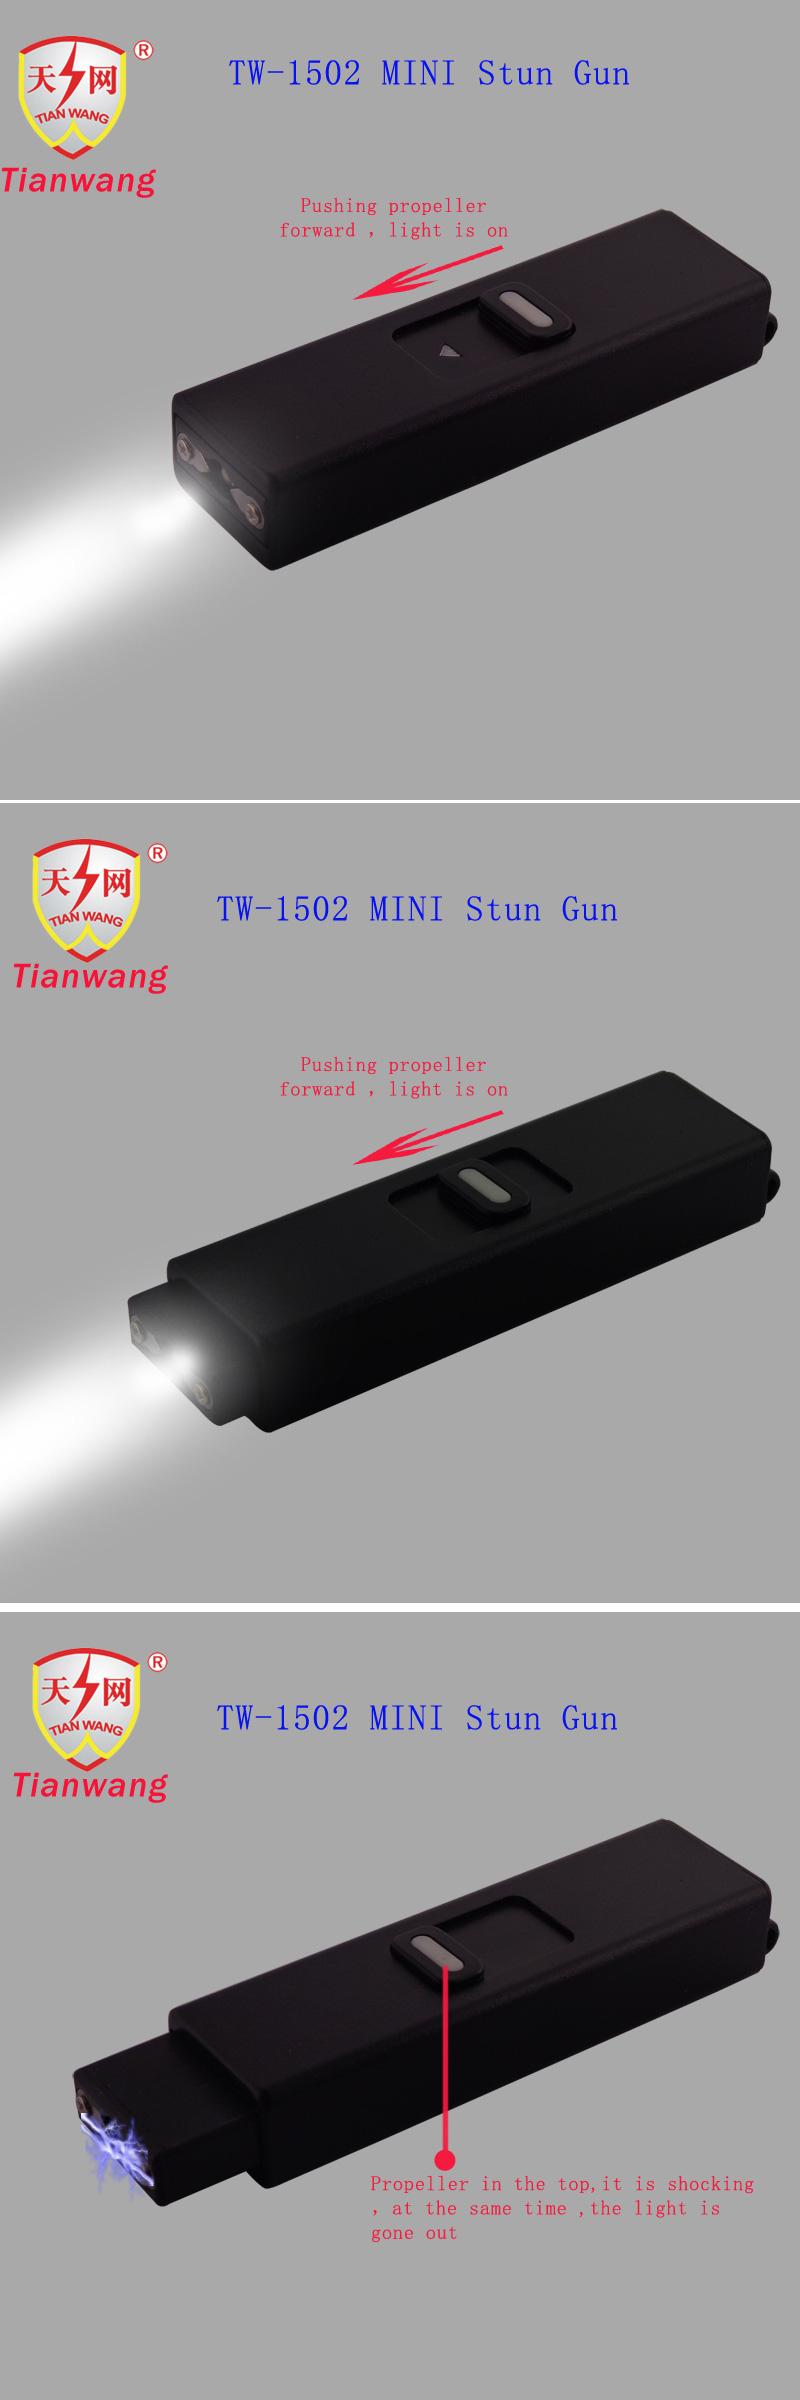 Tw Miniature New Design Stun Guns with Electric Shock